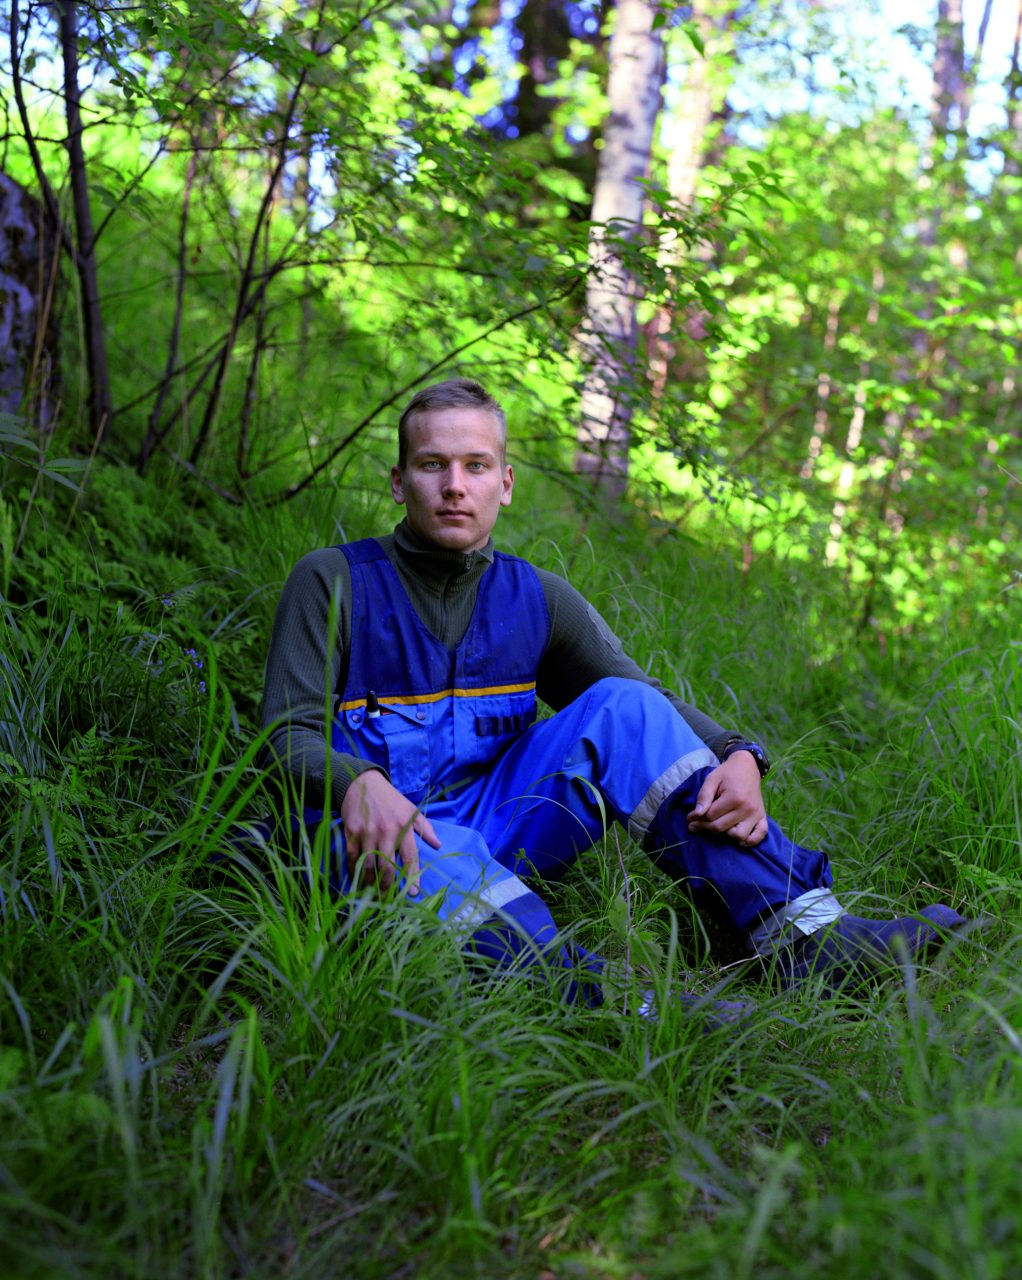 Kasaniya (Tracks), c-print, 100x80, 2013 / Finland, North Karelia. Juha Mantsinen, 19, was born and grew up near Joensuu. He currently serves in the army